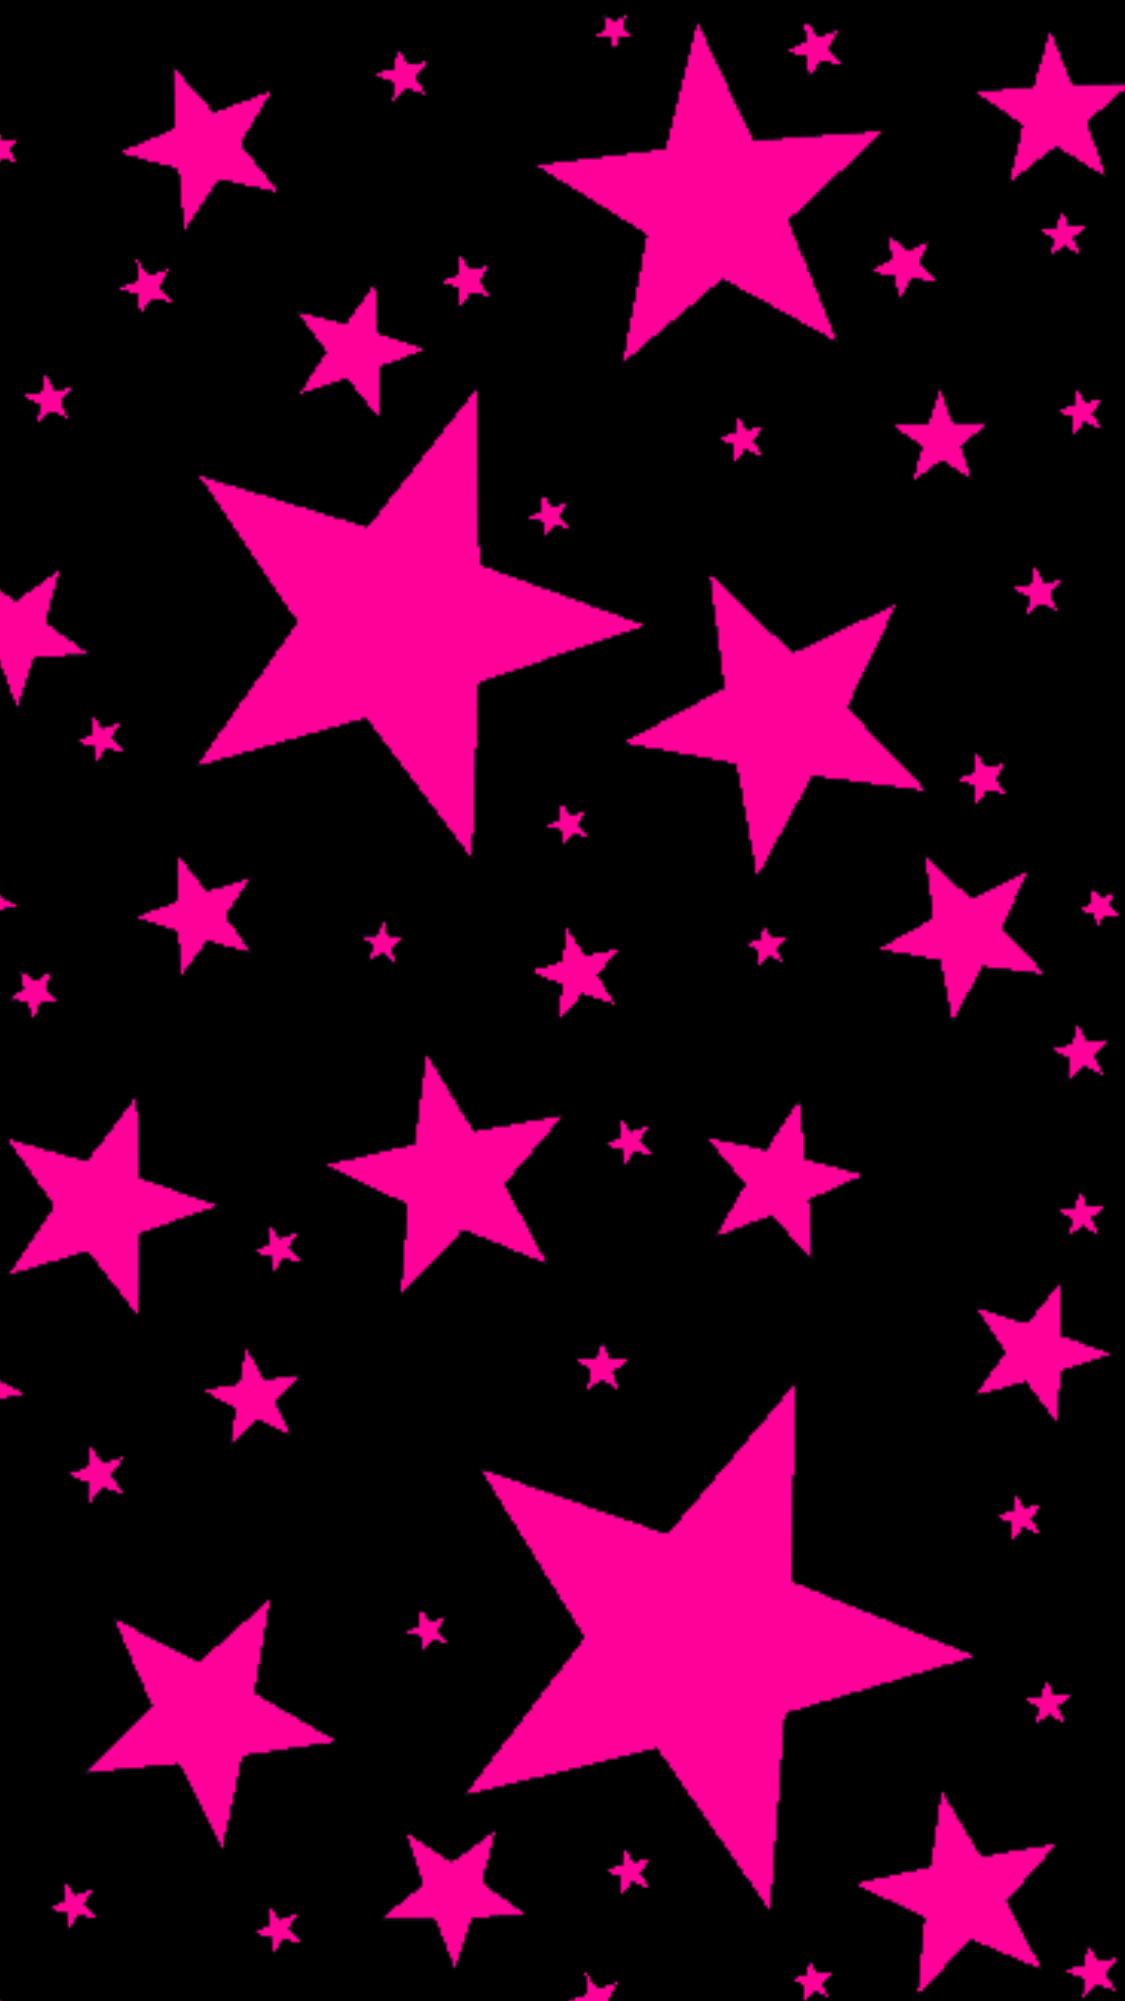 Обои на телефон со звездами на черном фоне